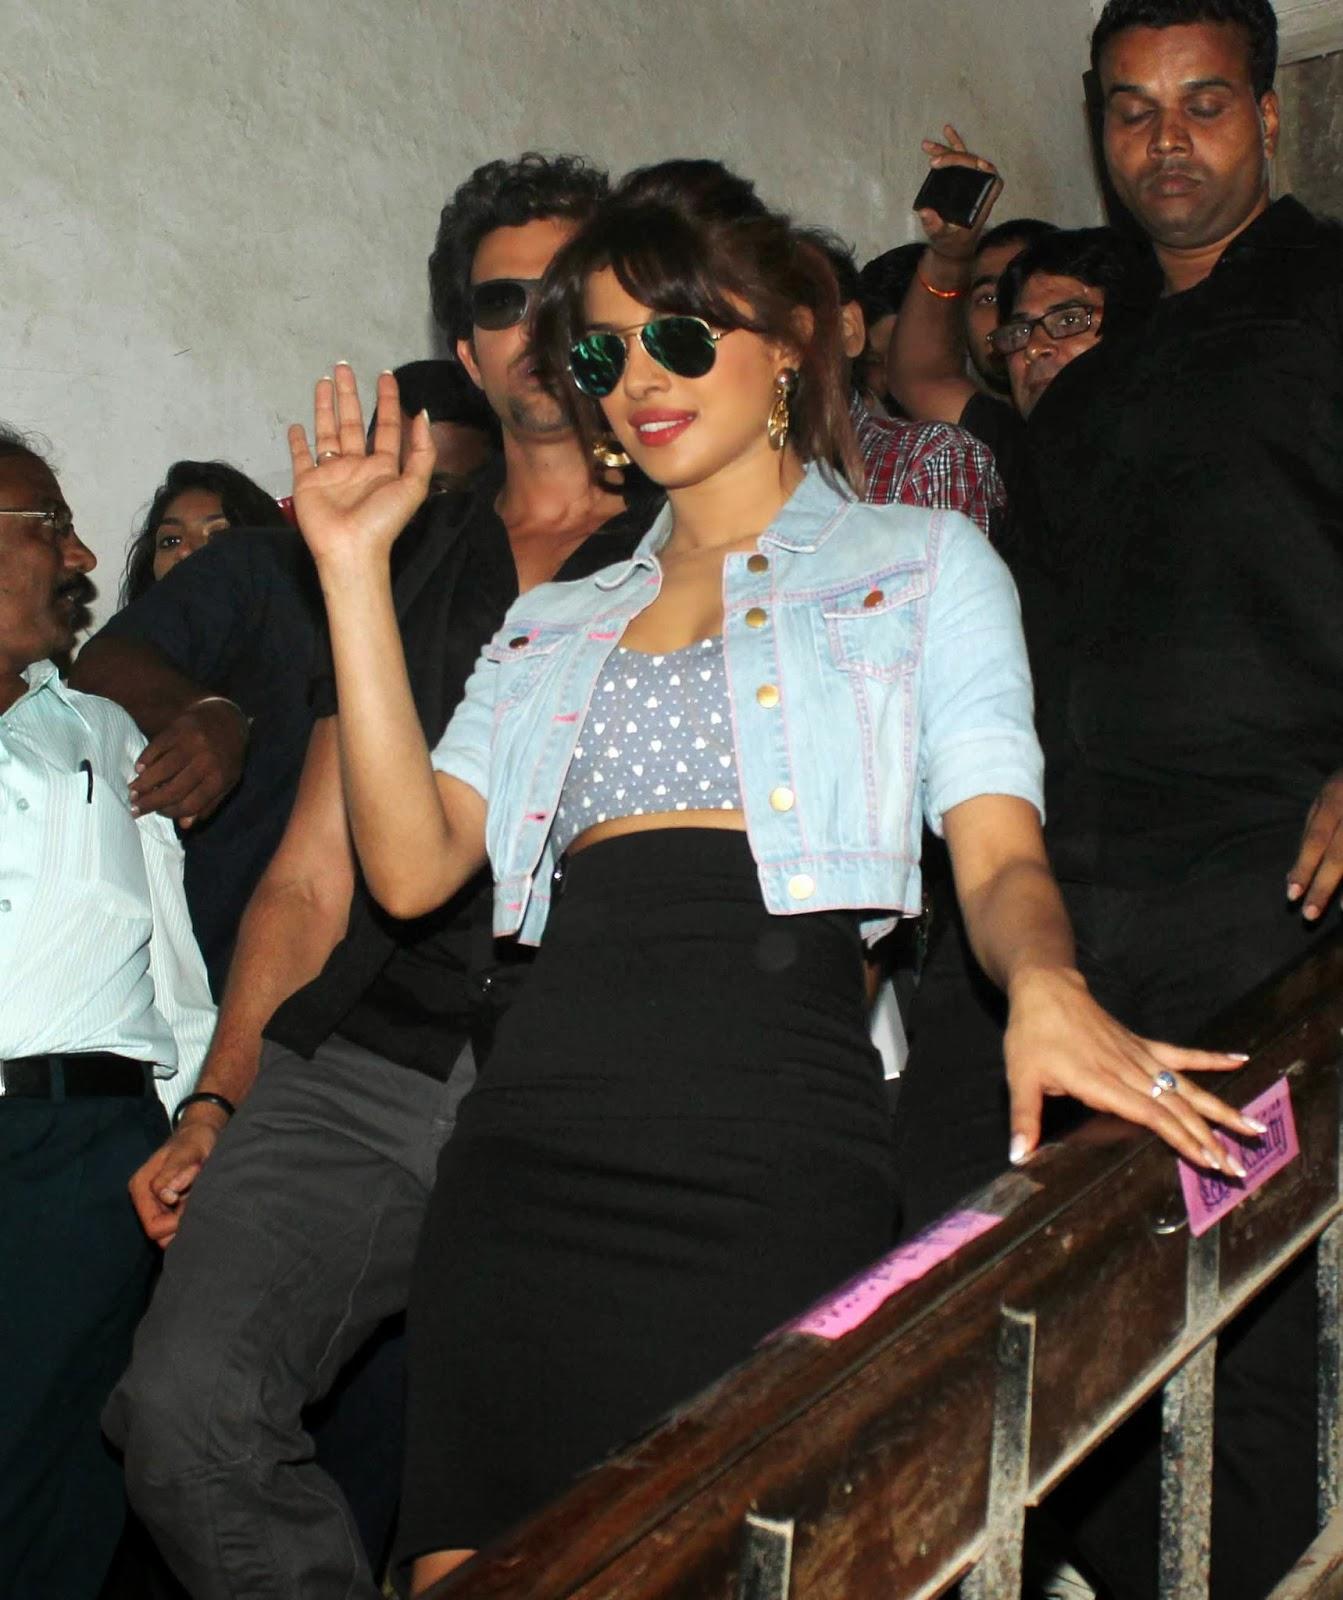 Hritik Roshan and Priyanka Snapped Promoting Krrish 3 Movie 22.JPG